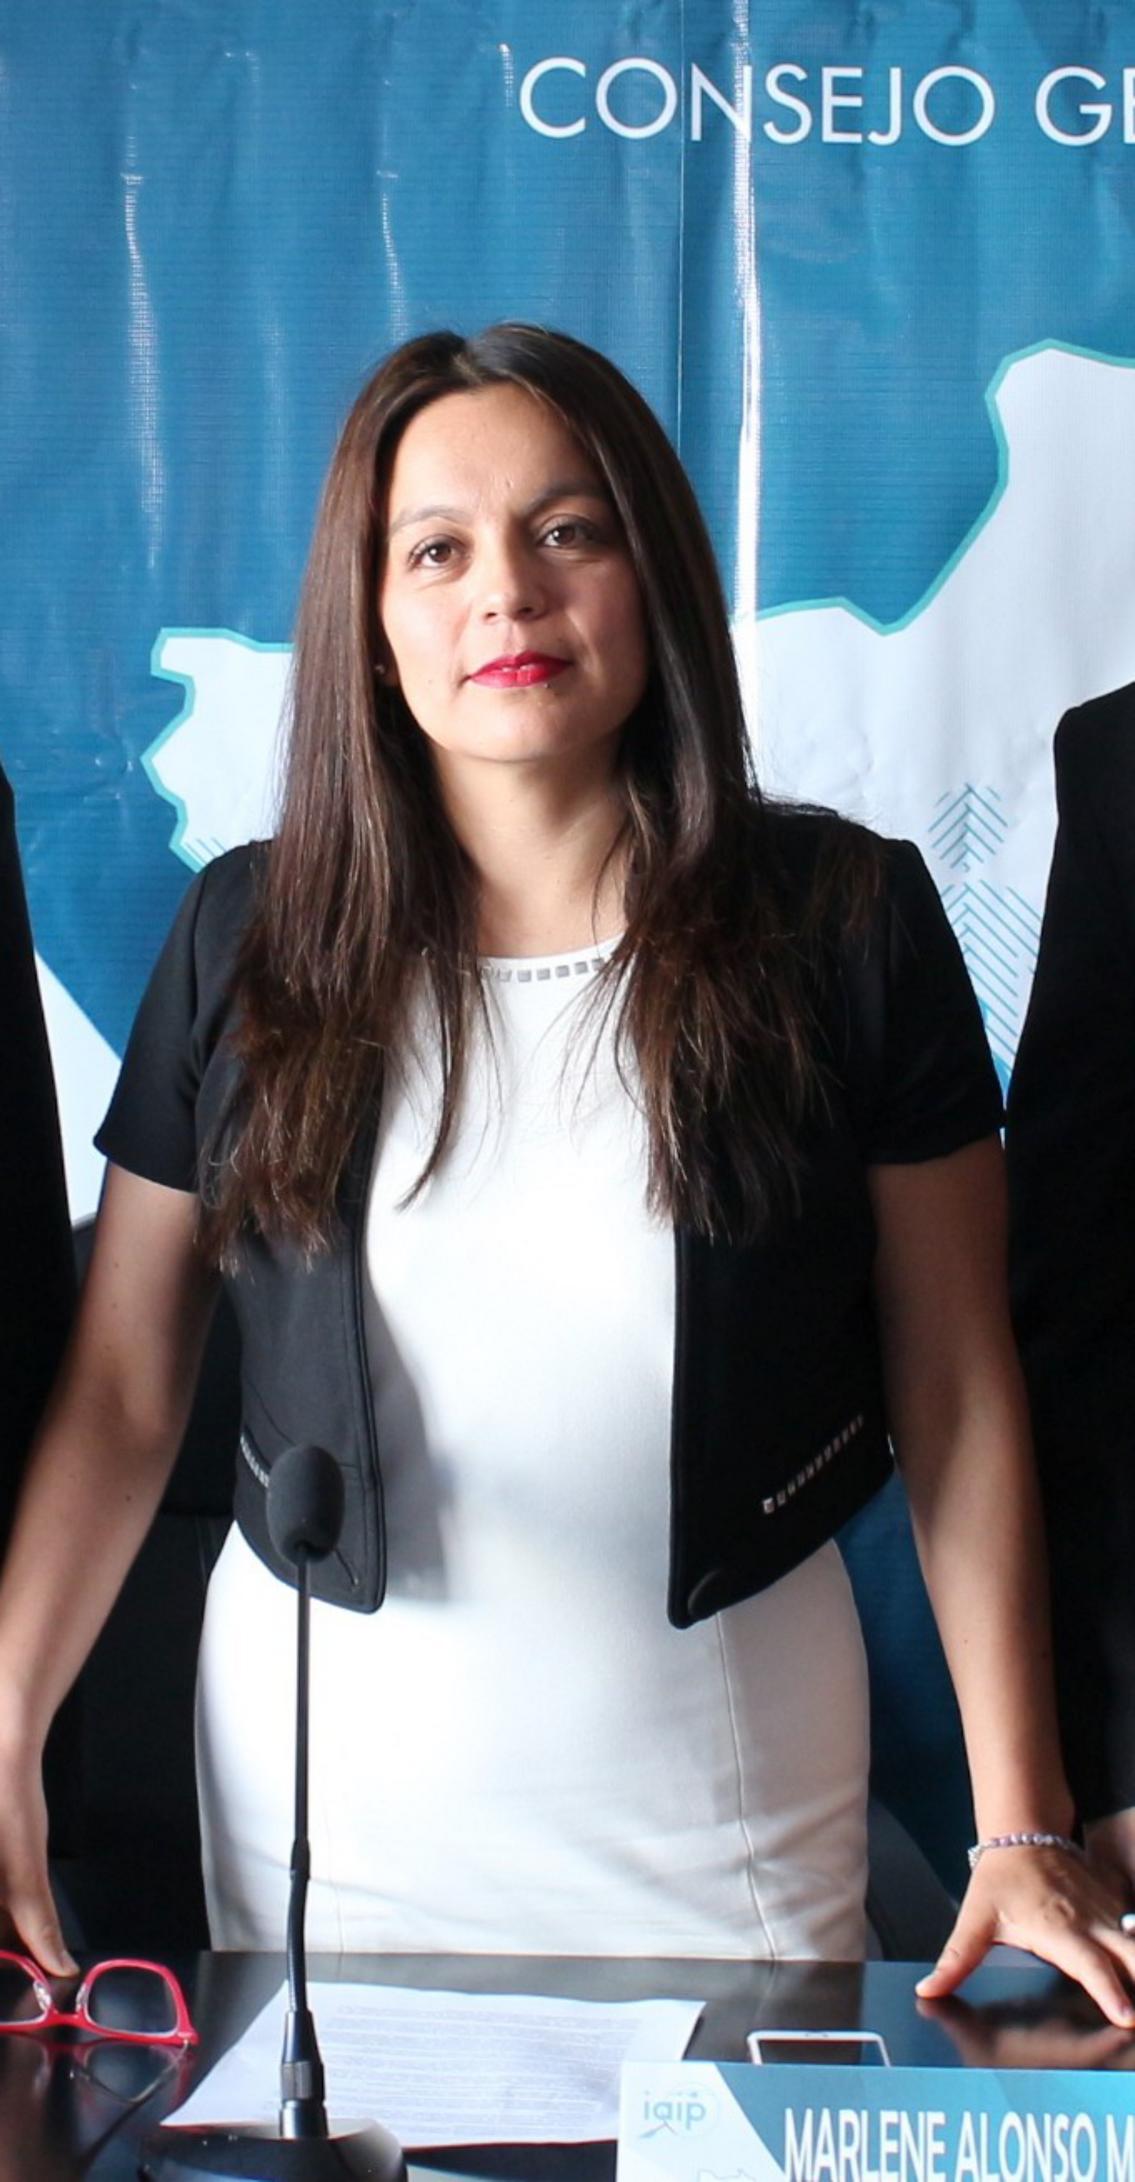 Lic. Marlene Alonso Meneses